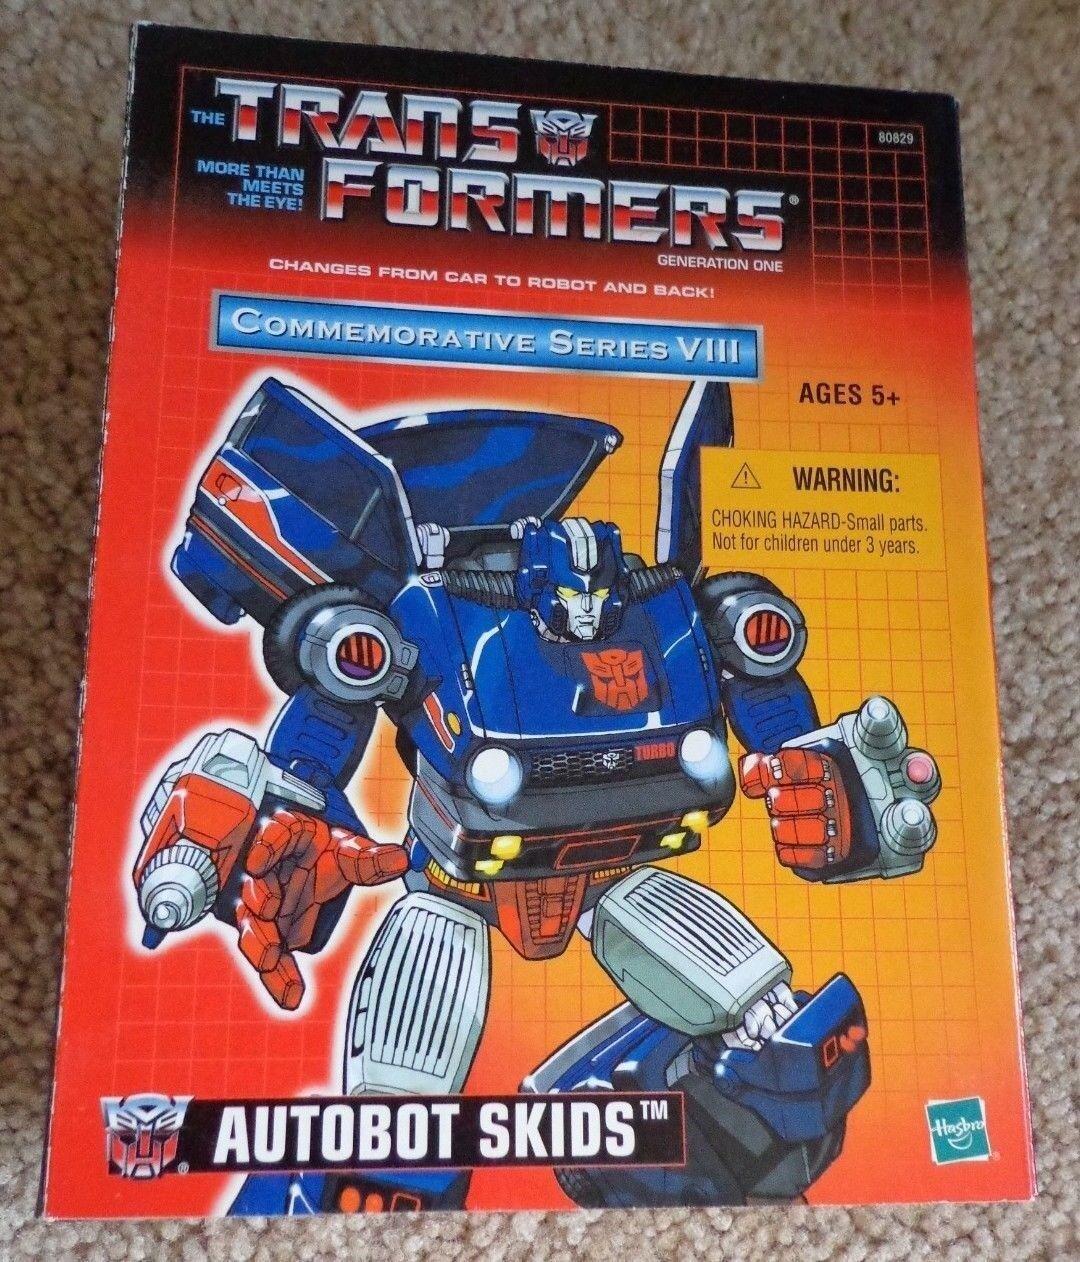 Transformers Autobot Skids Nuevo en caja sellada de la serie conmemorativa VIII